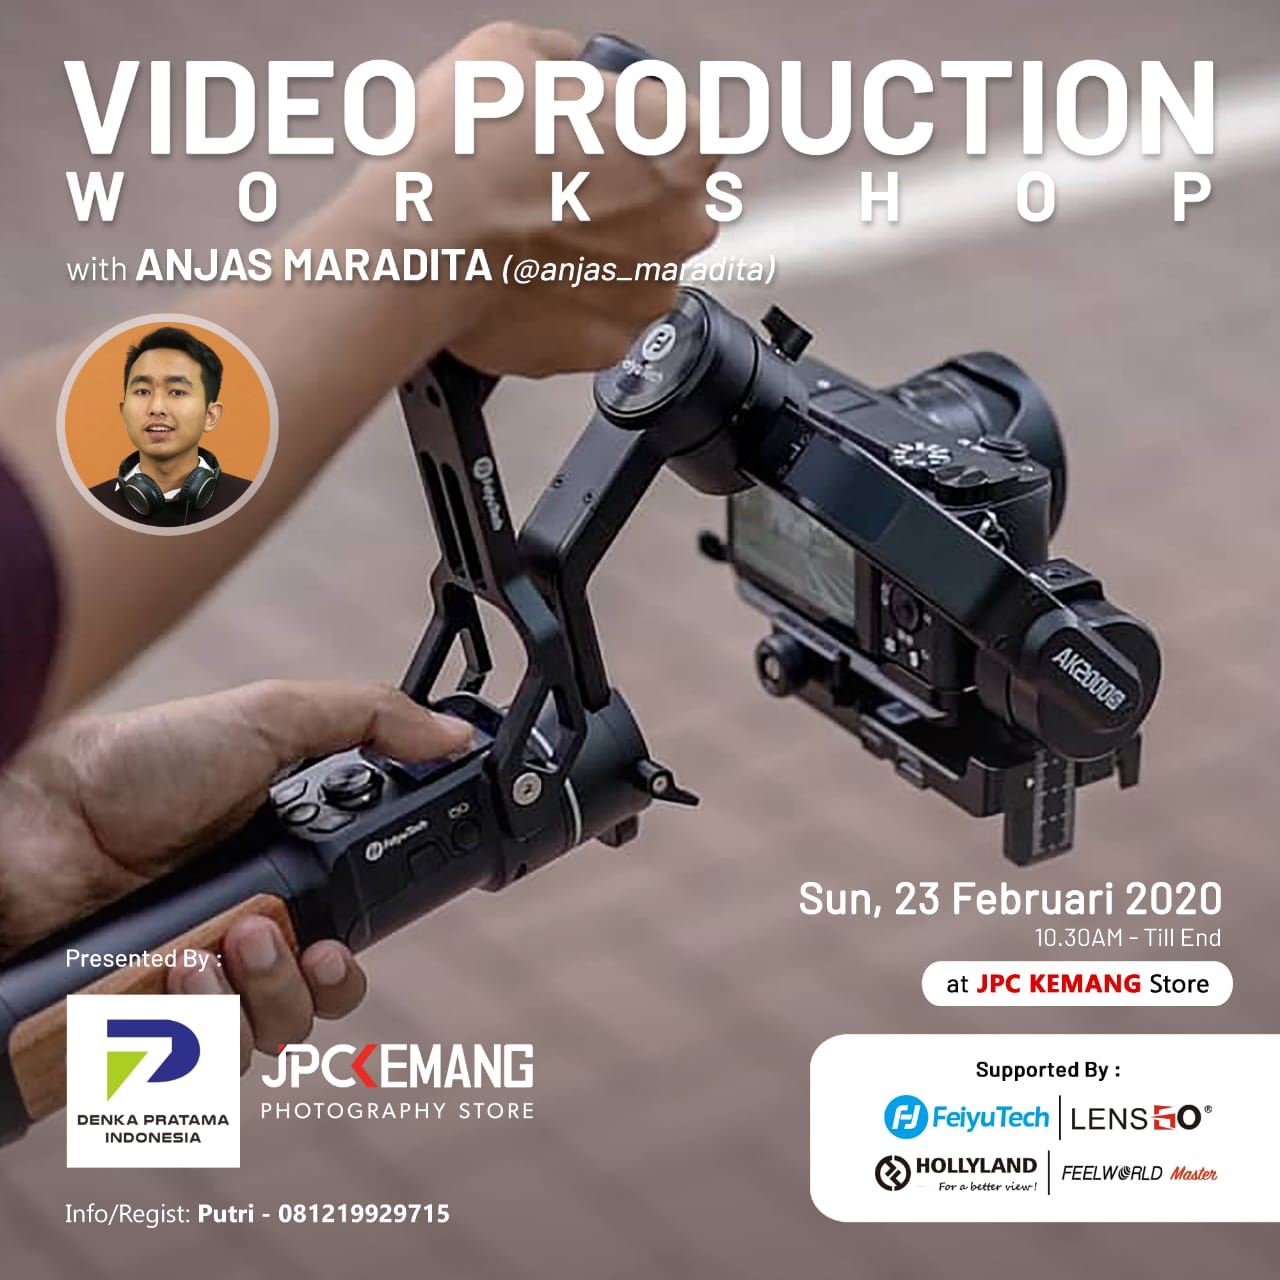 Video Production Workshop